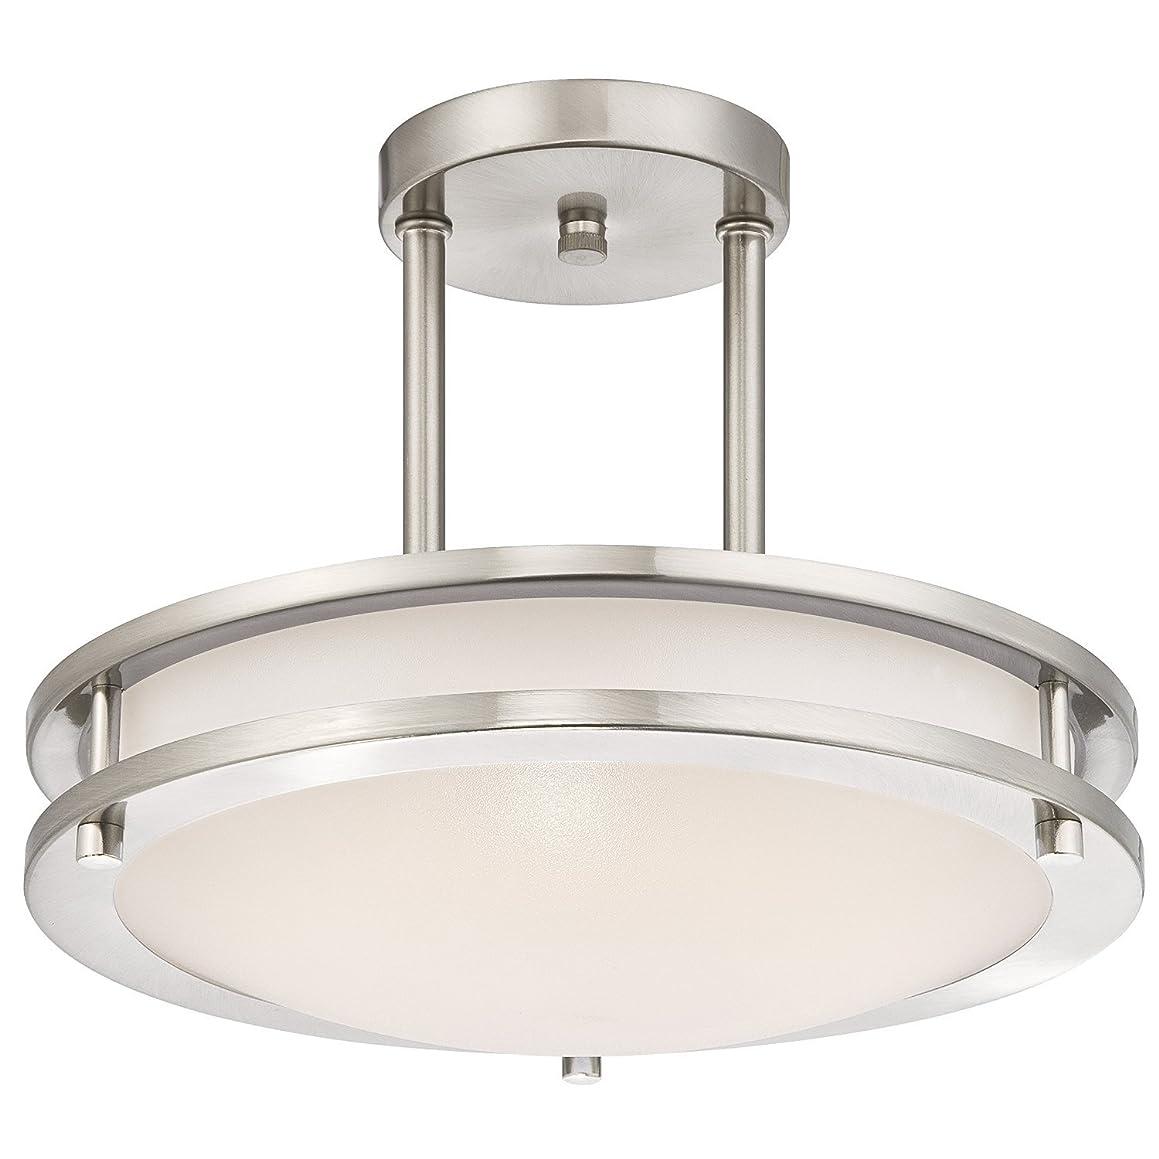 LB72130 LED Semi Flush Mount Ceiling Fixture, Antique Brushed Nickel Finish, 3000K Warm White, 1050 Lumens, Dimmable